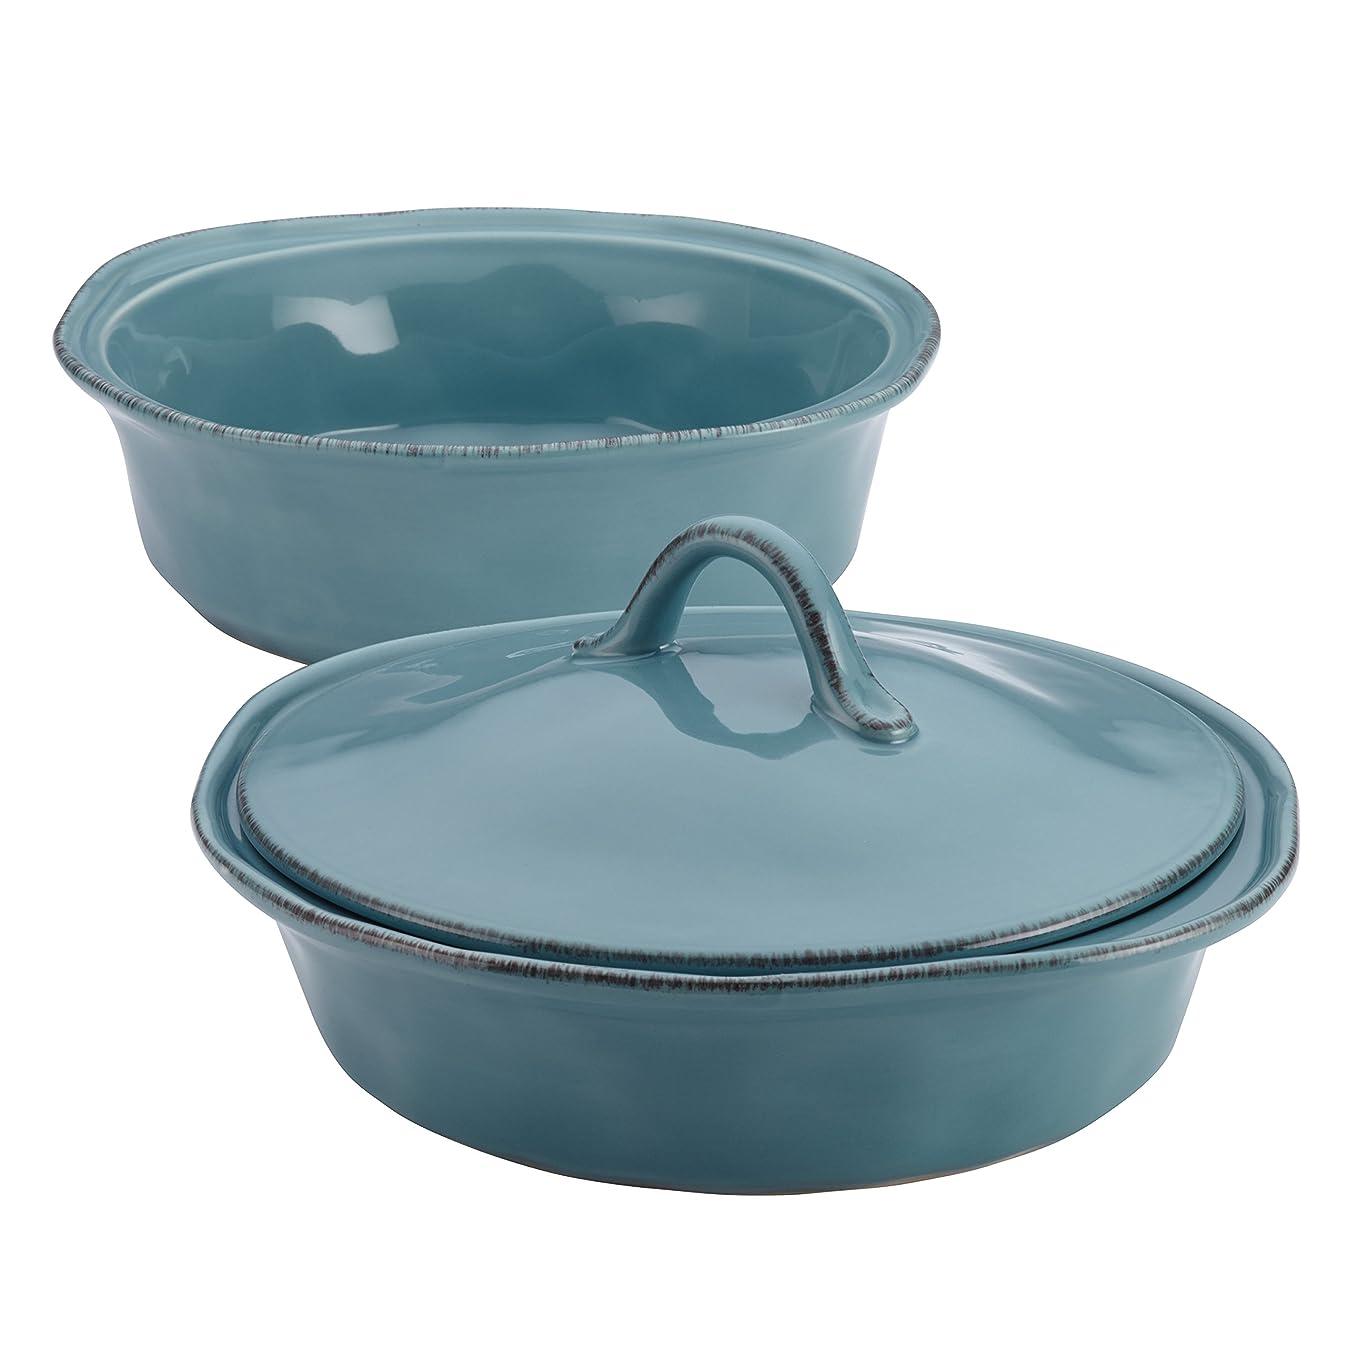 Rachael Ray 58314 Cucina Stoneware Casserole Set, 3-Piece Casserole & Lid, Agave Blue